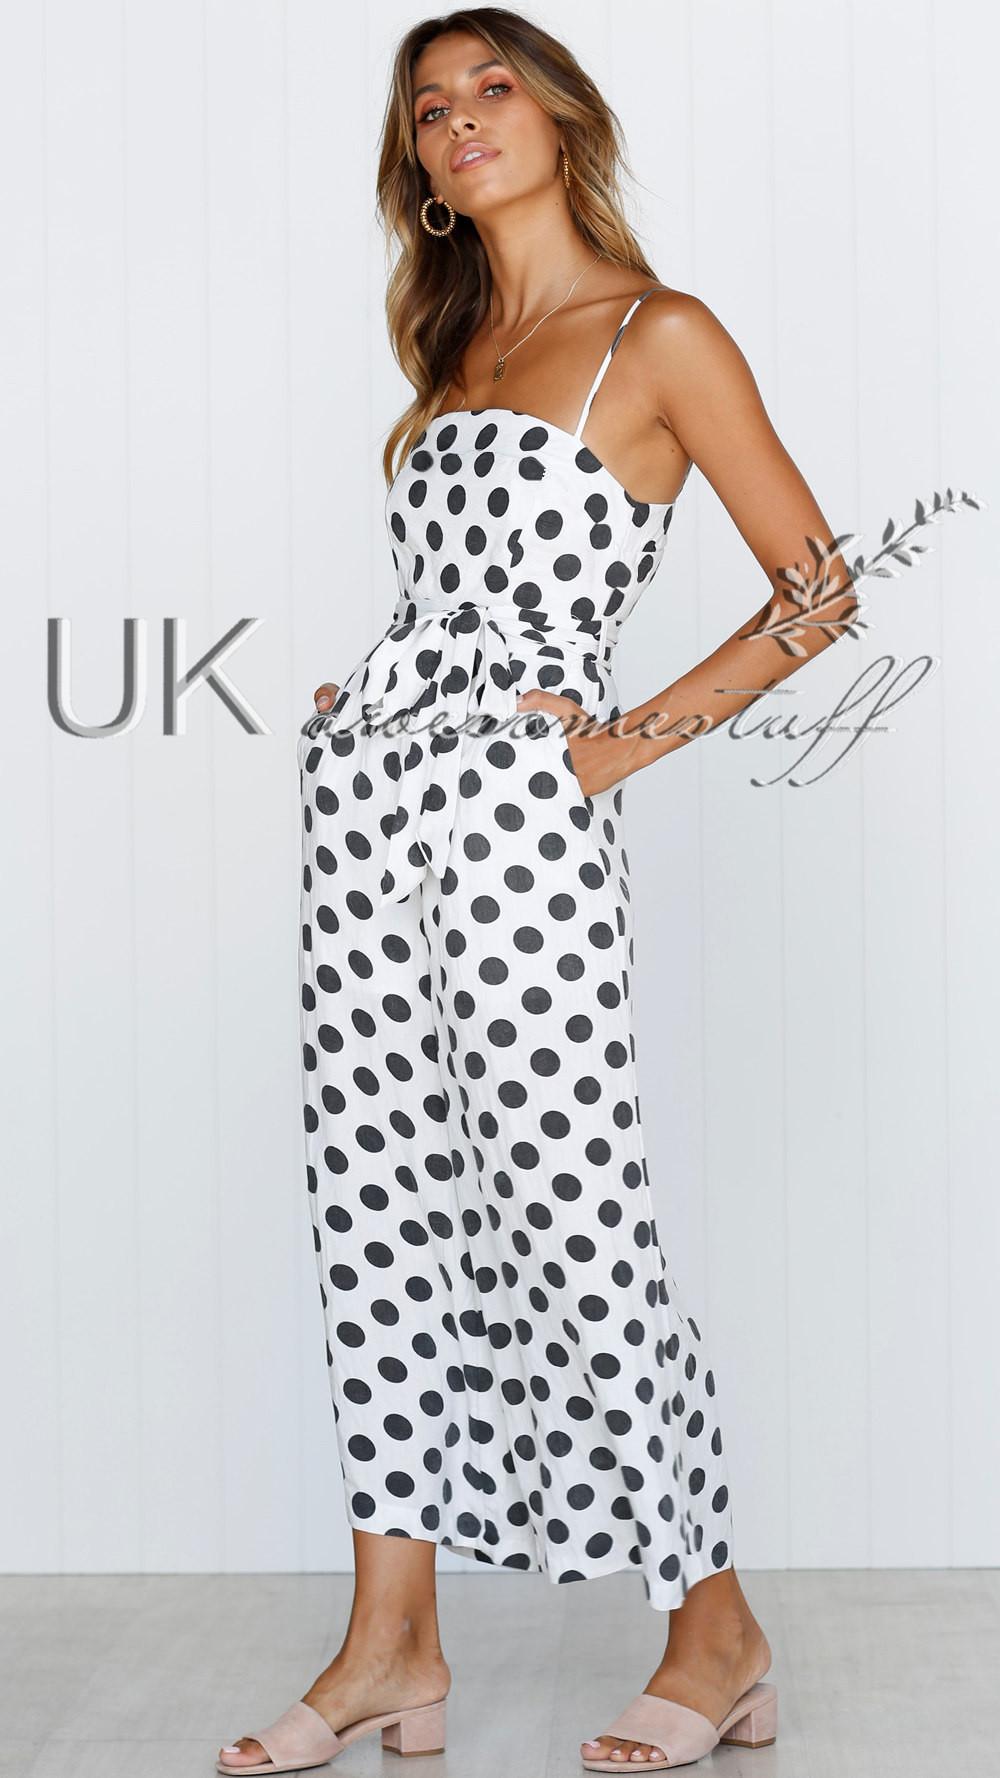 UK Womens Polkadot Wide Leg Jumpsuit Ladies Evening Party Playsuit Size 6-16